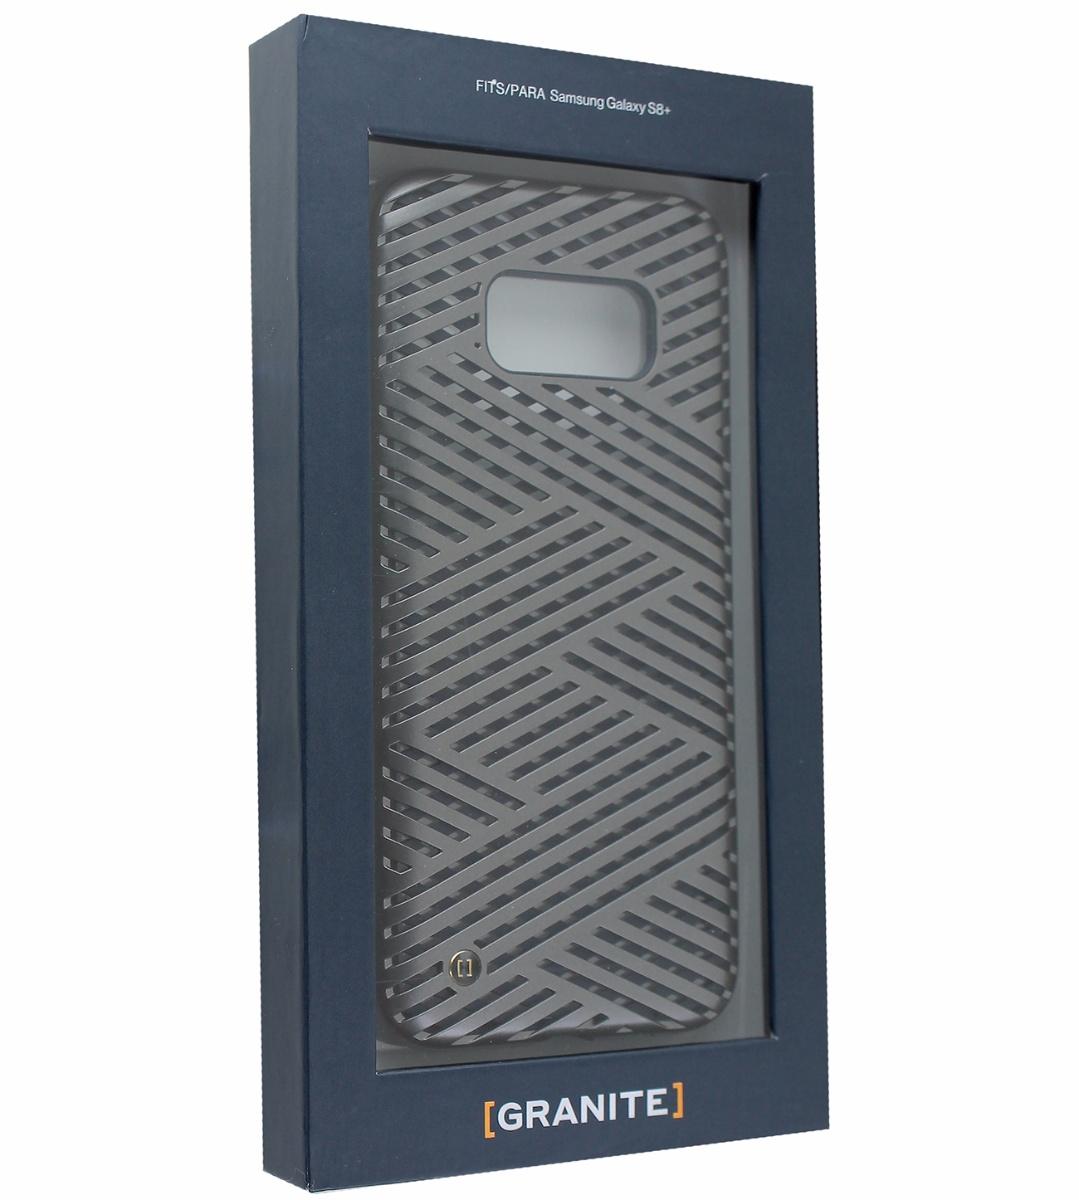 Granite Kaiser Series Slim Case Cover for Samsung Galaxy S8+ Plus - Gray